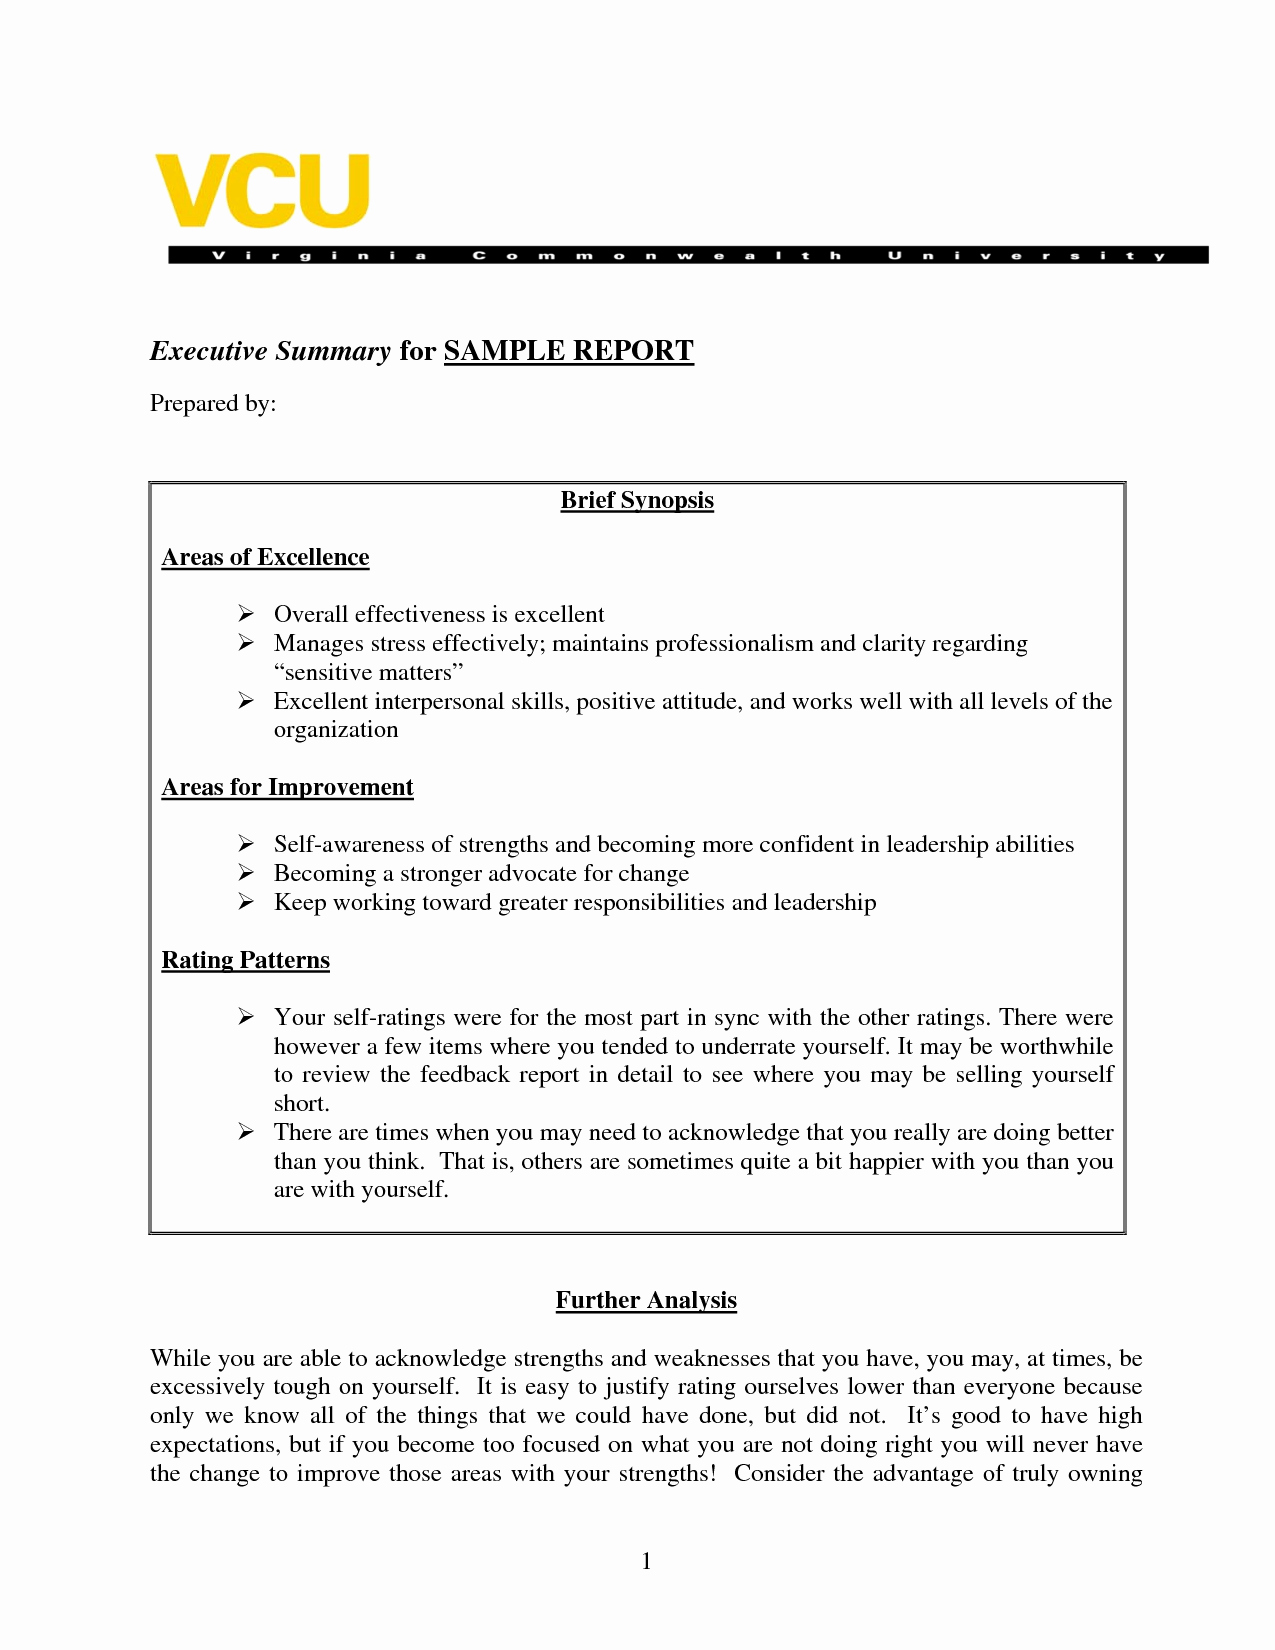 Samples Of Executive Summary Report Beautiful Sample Executive Summary A Report Template Business